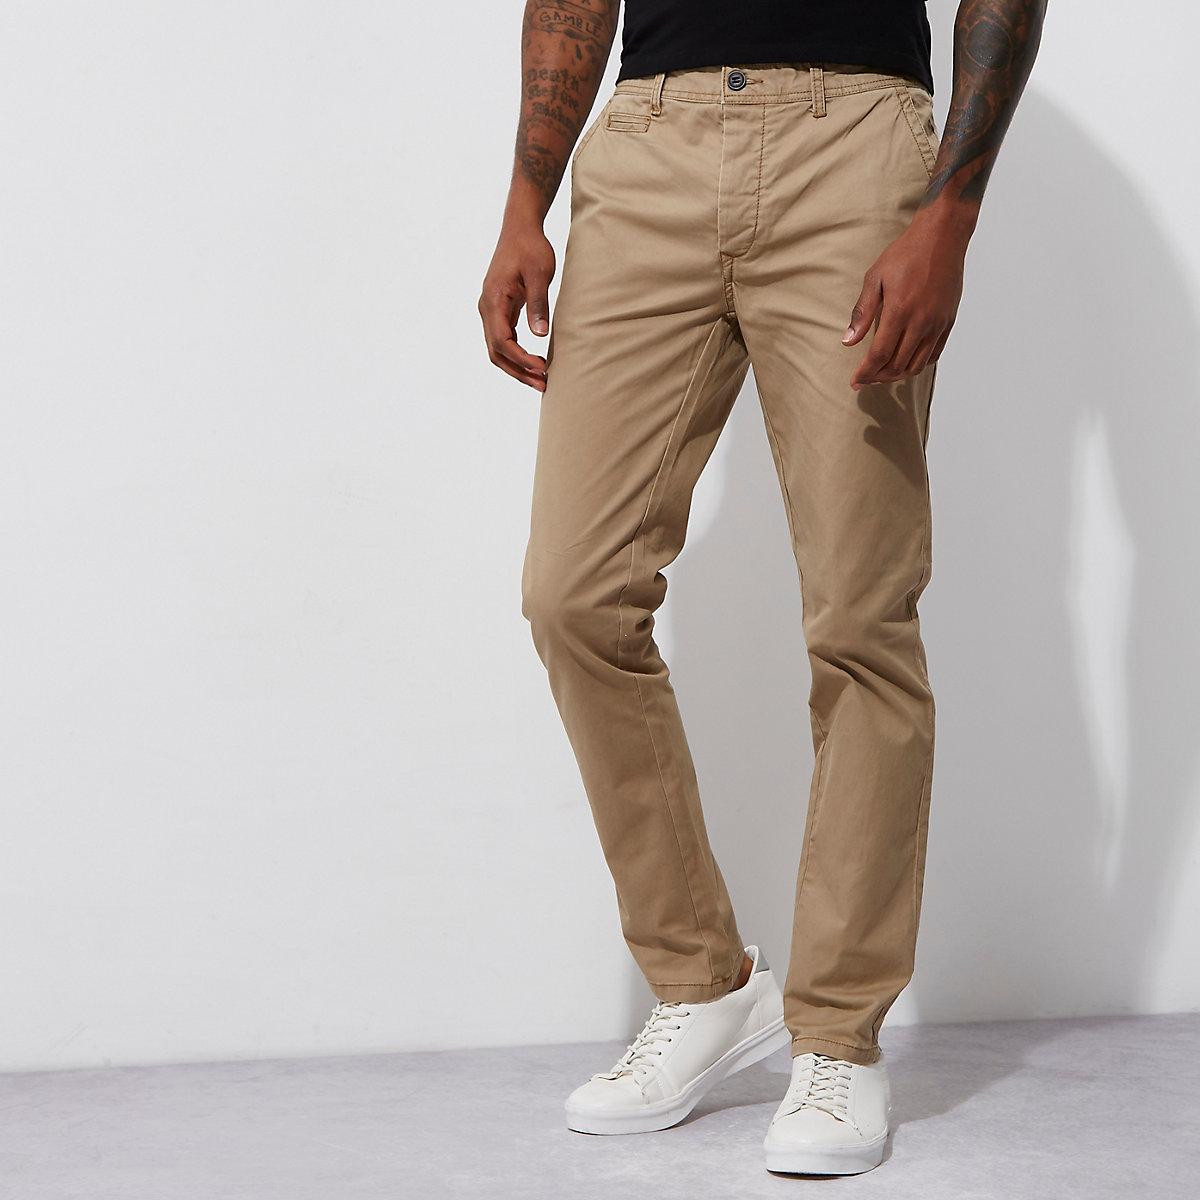 Light brown stretch skinny chino pants